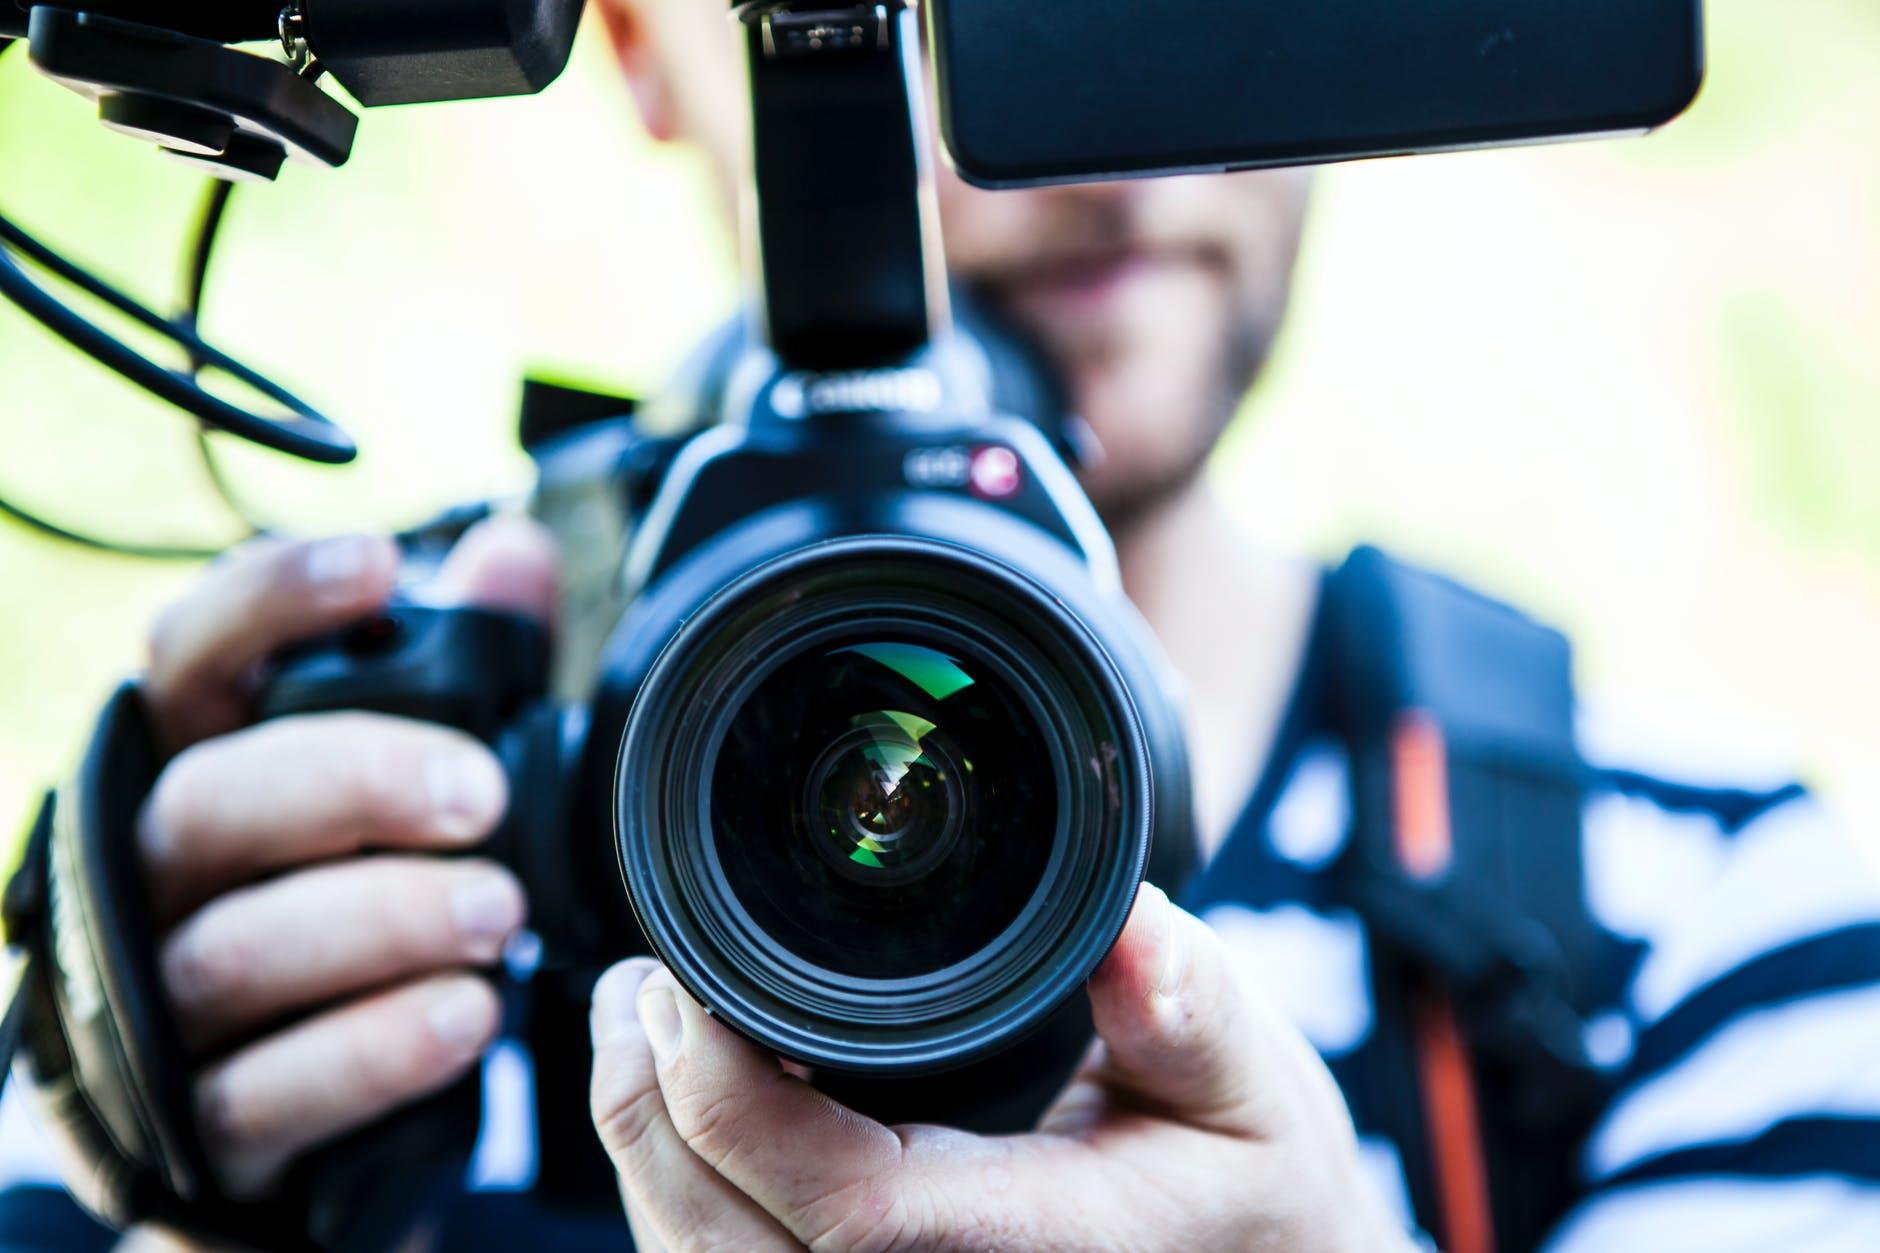 a man holding a camera lens